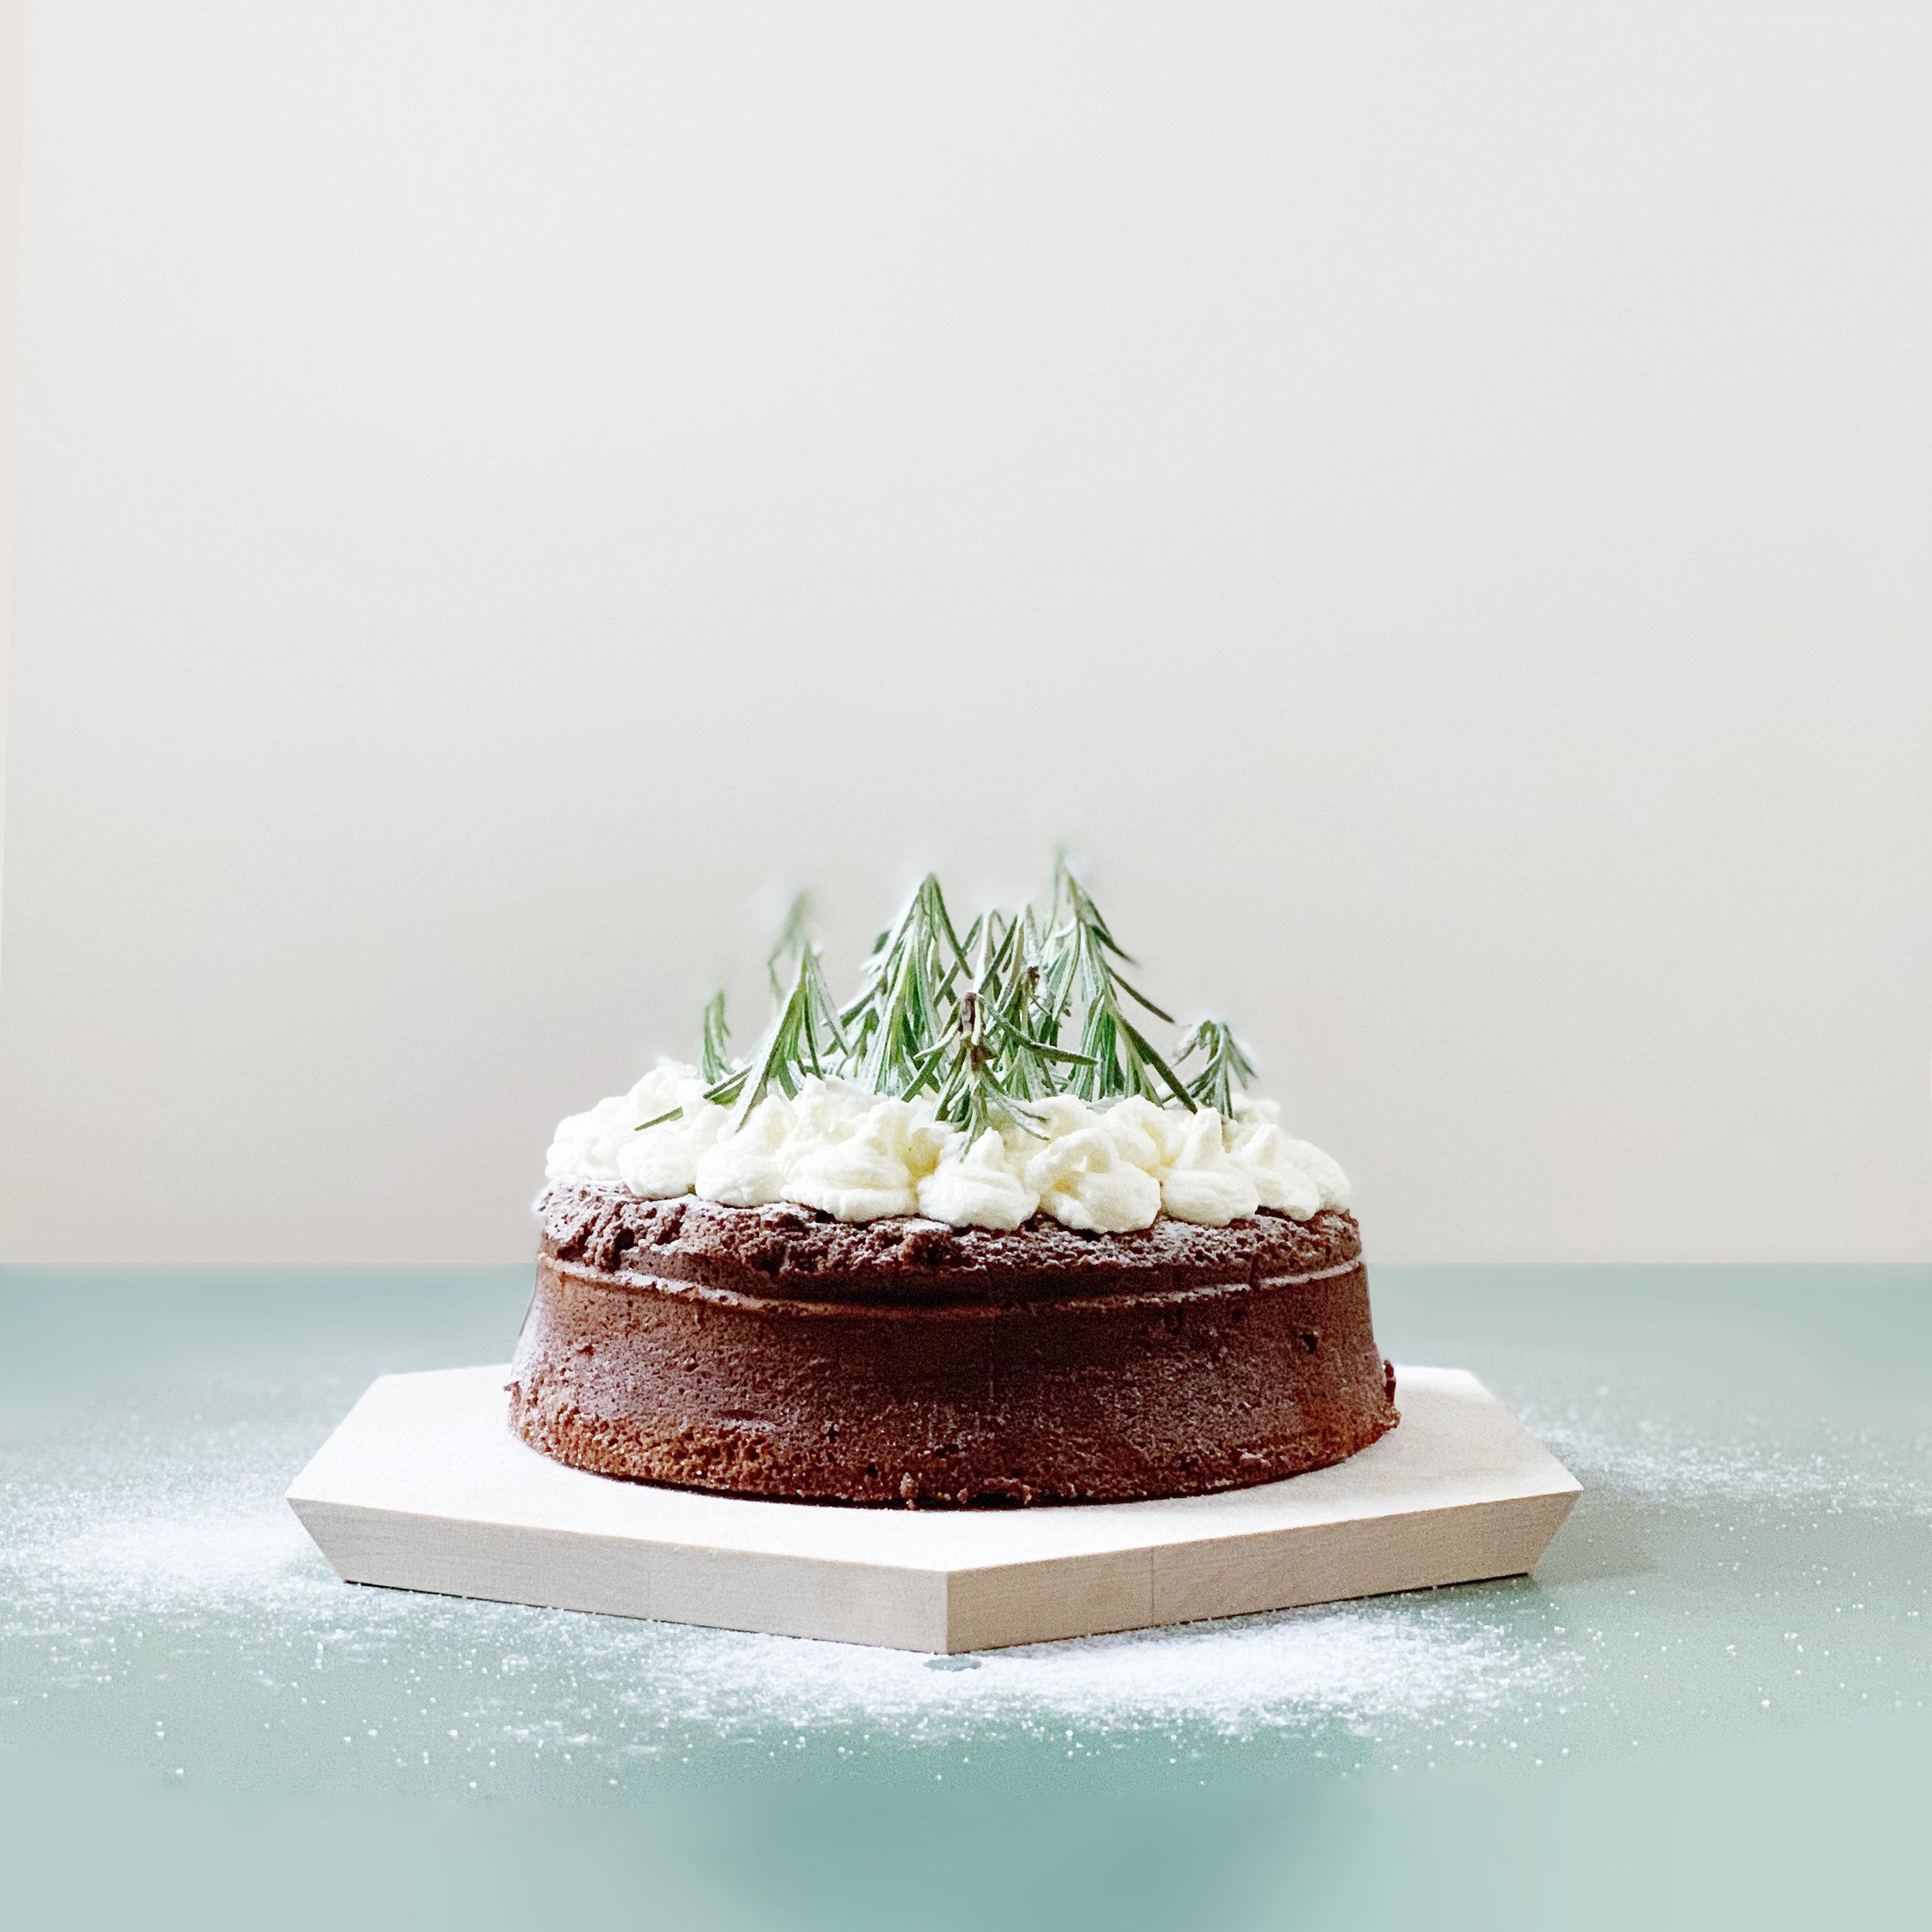 Festive chocolate fudge cake with mascarpone frosting